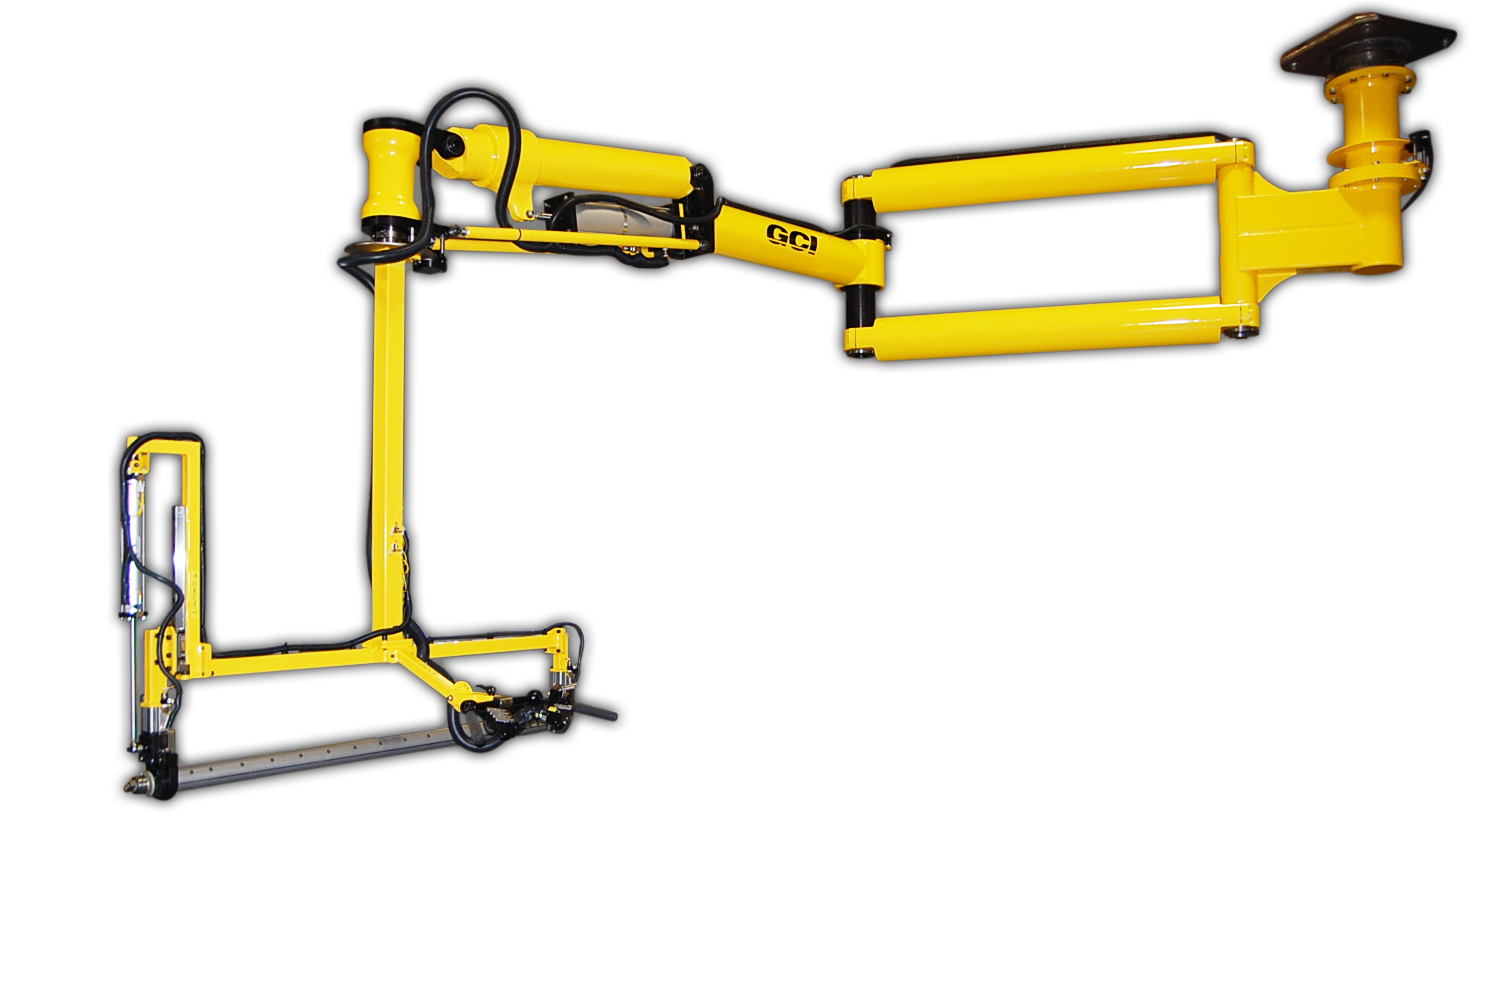 Ergonomic Industrial Manipulator : Industrial manipulators ohio tool systems